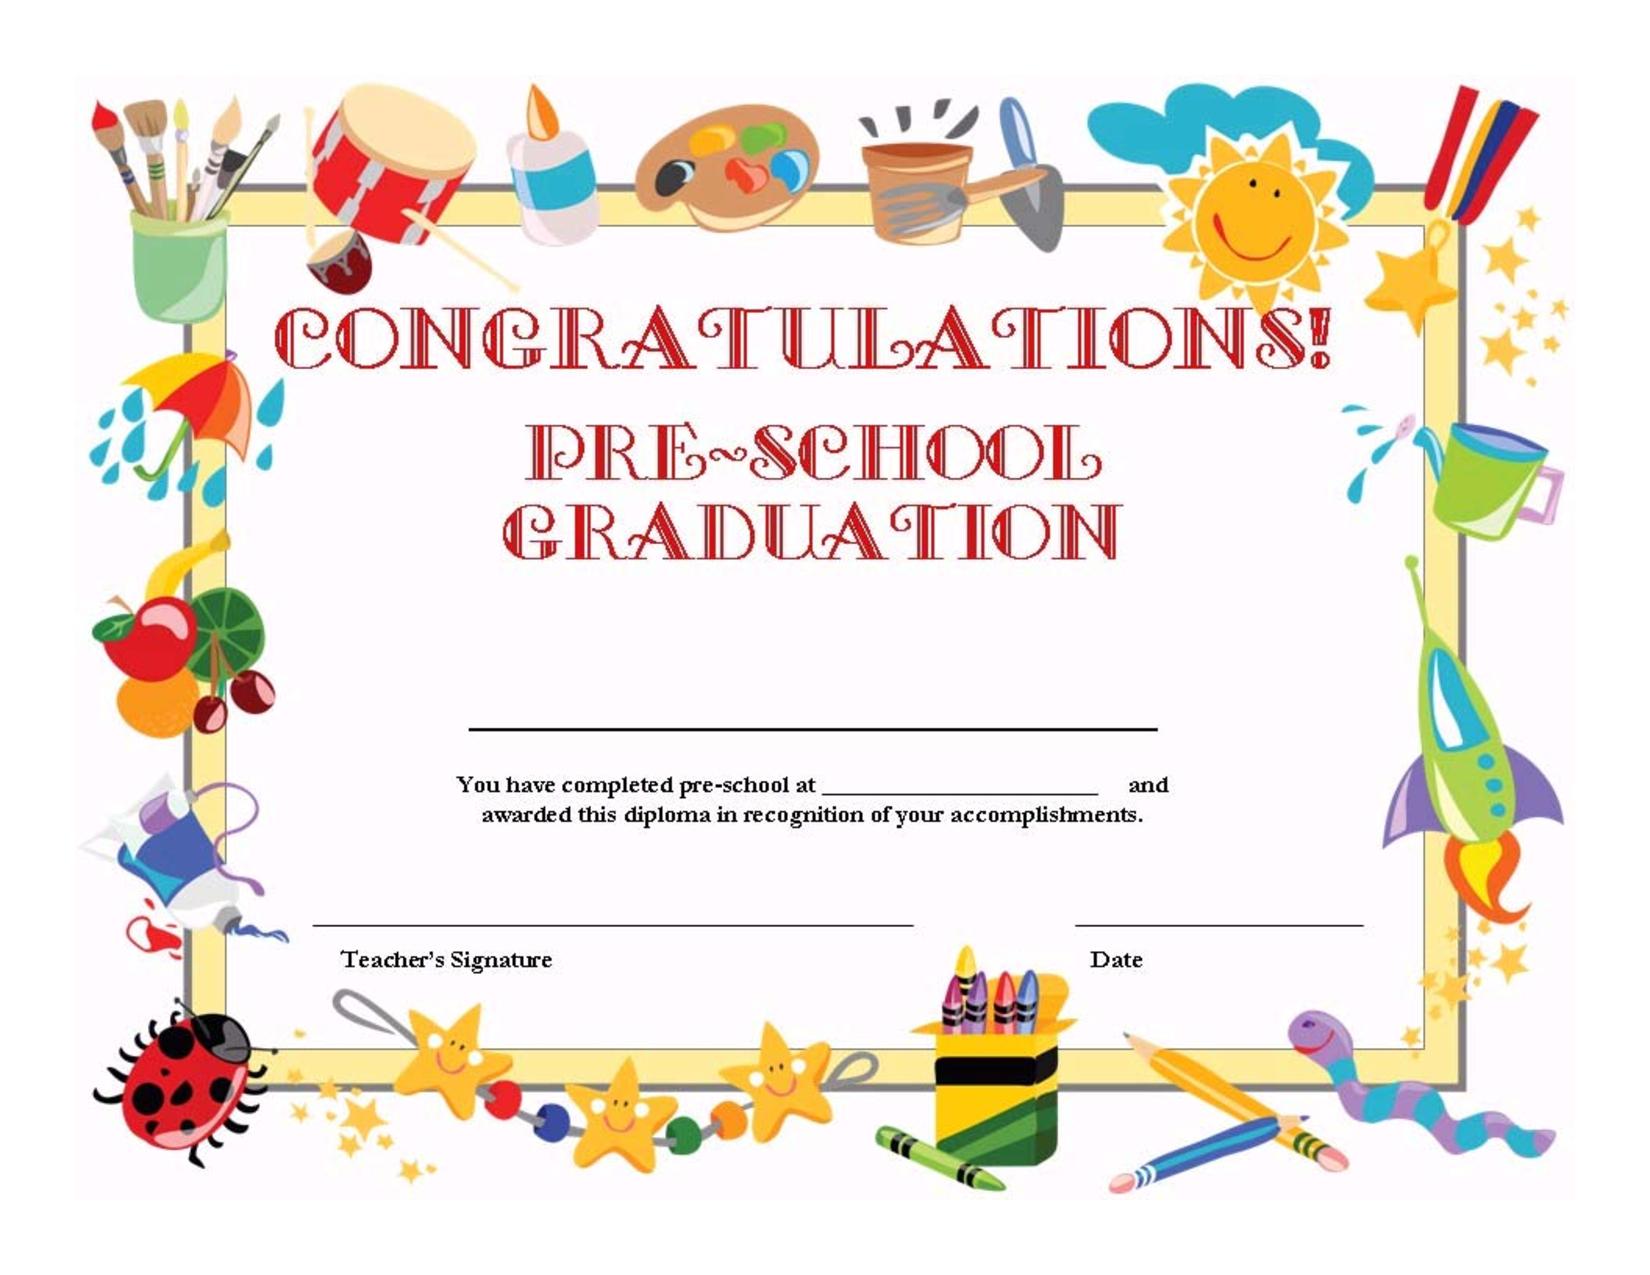 Preschool Graduation Certificate Template Free   School   Graduation - Free Printable First Day Of School Certificate